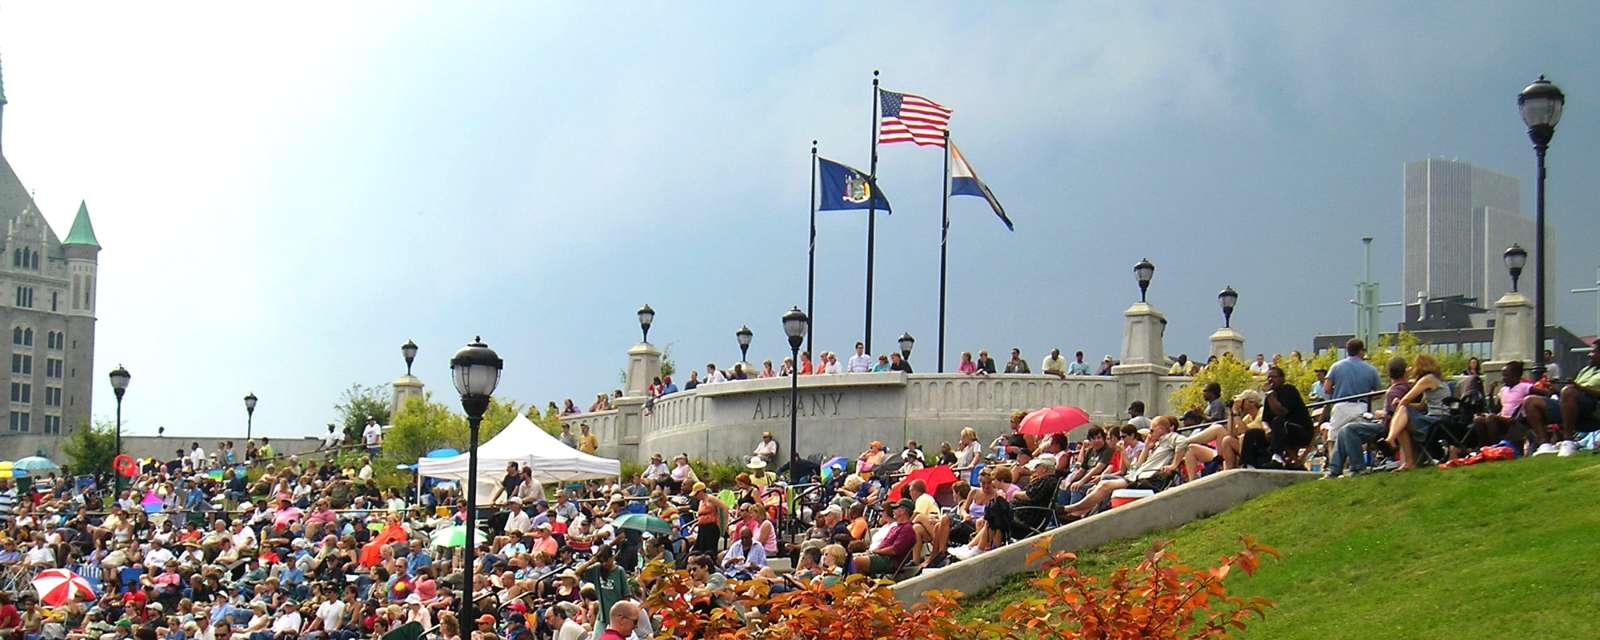 Albany Riverfront Jazz Festival